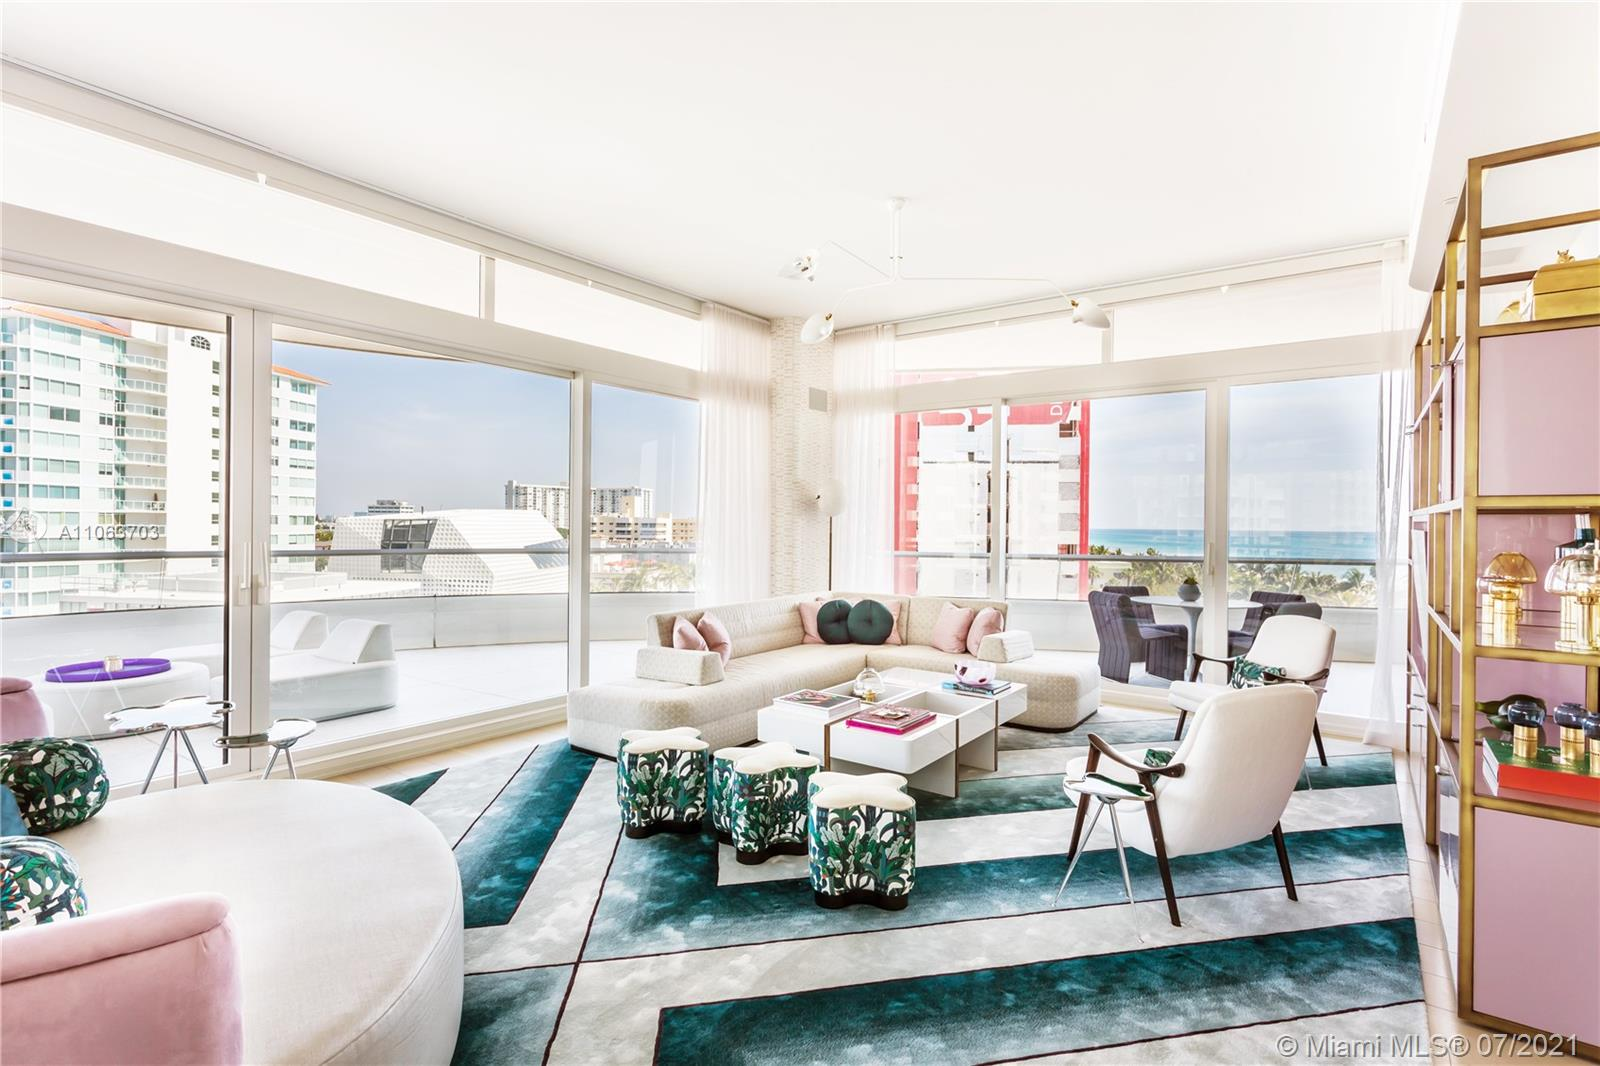 3315 Collins Ave, Unit #6C Luxury Real Estate